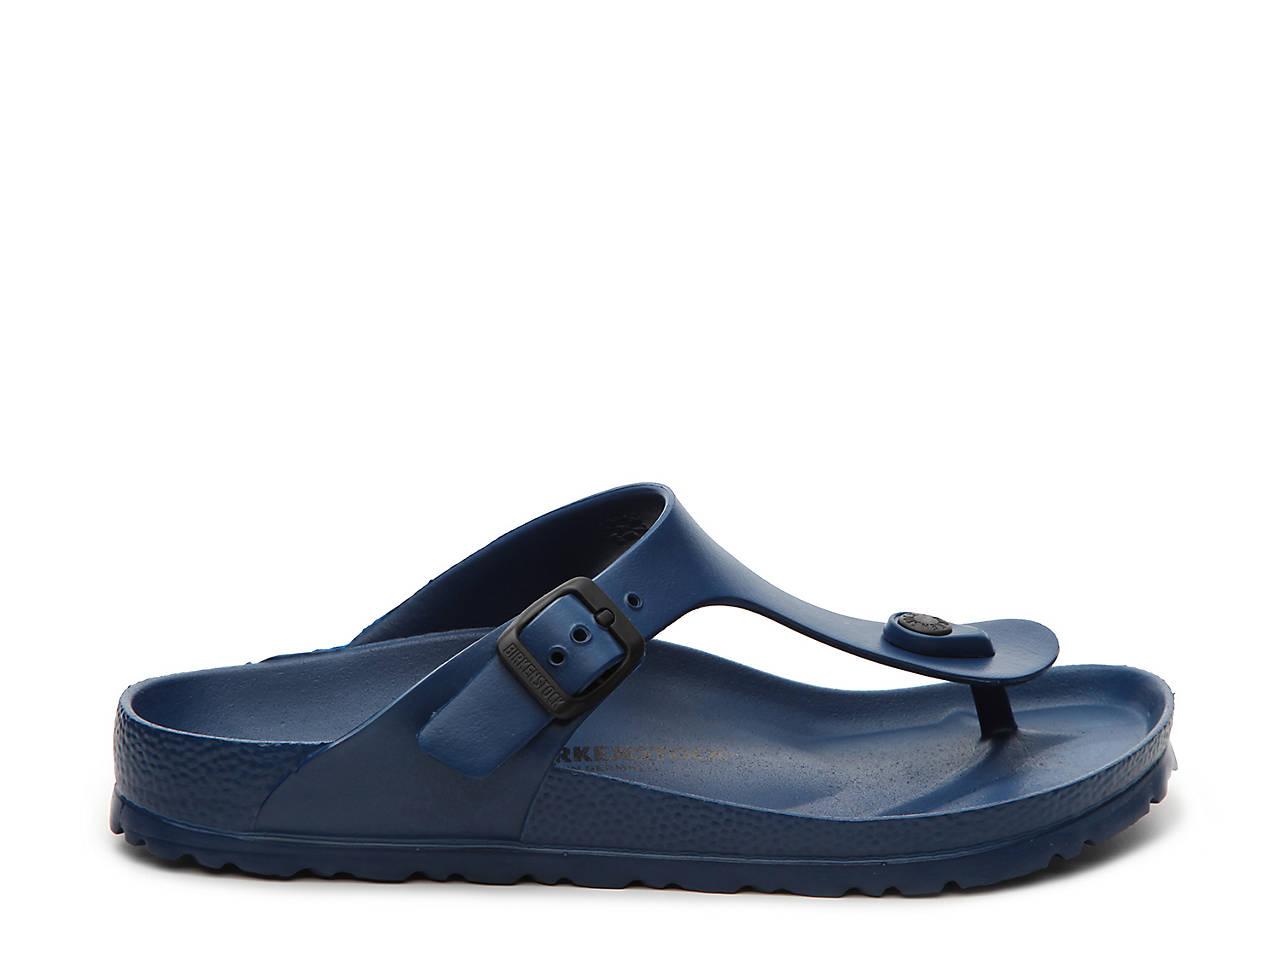 928c26aa873a Birkenstock Essentials Gizeh EVA Sandal - Women s Women s Shoes